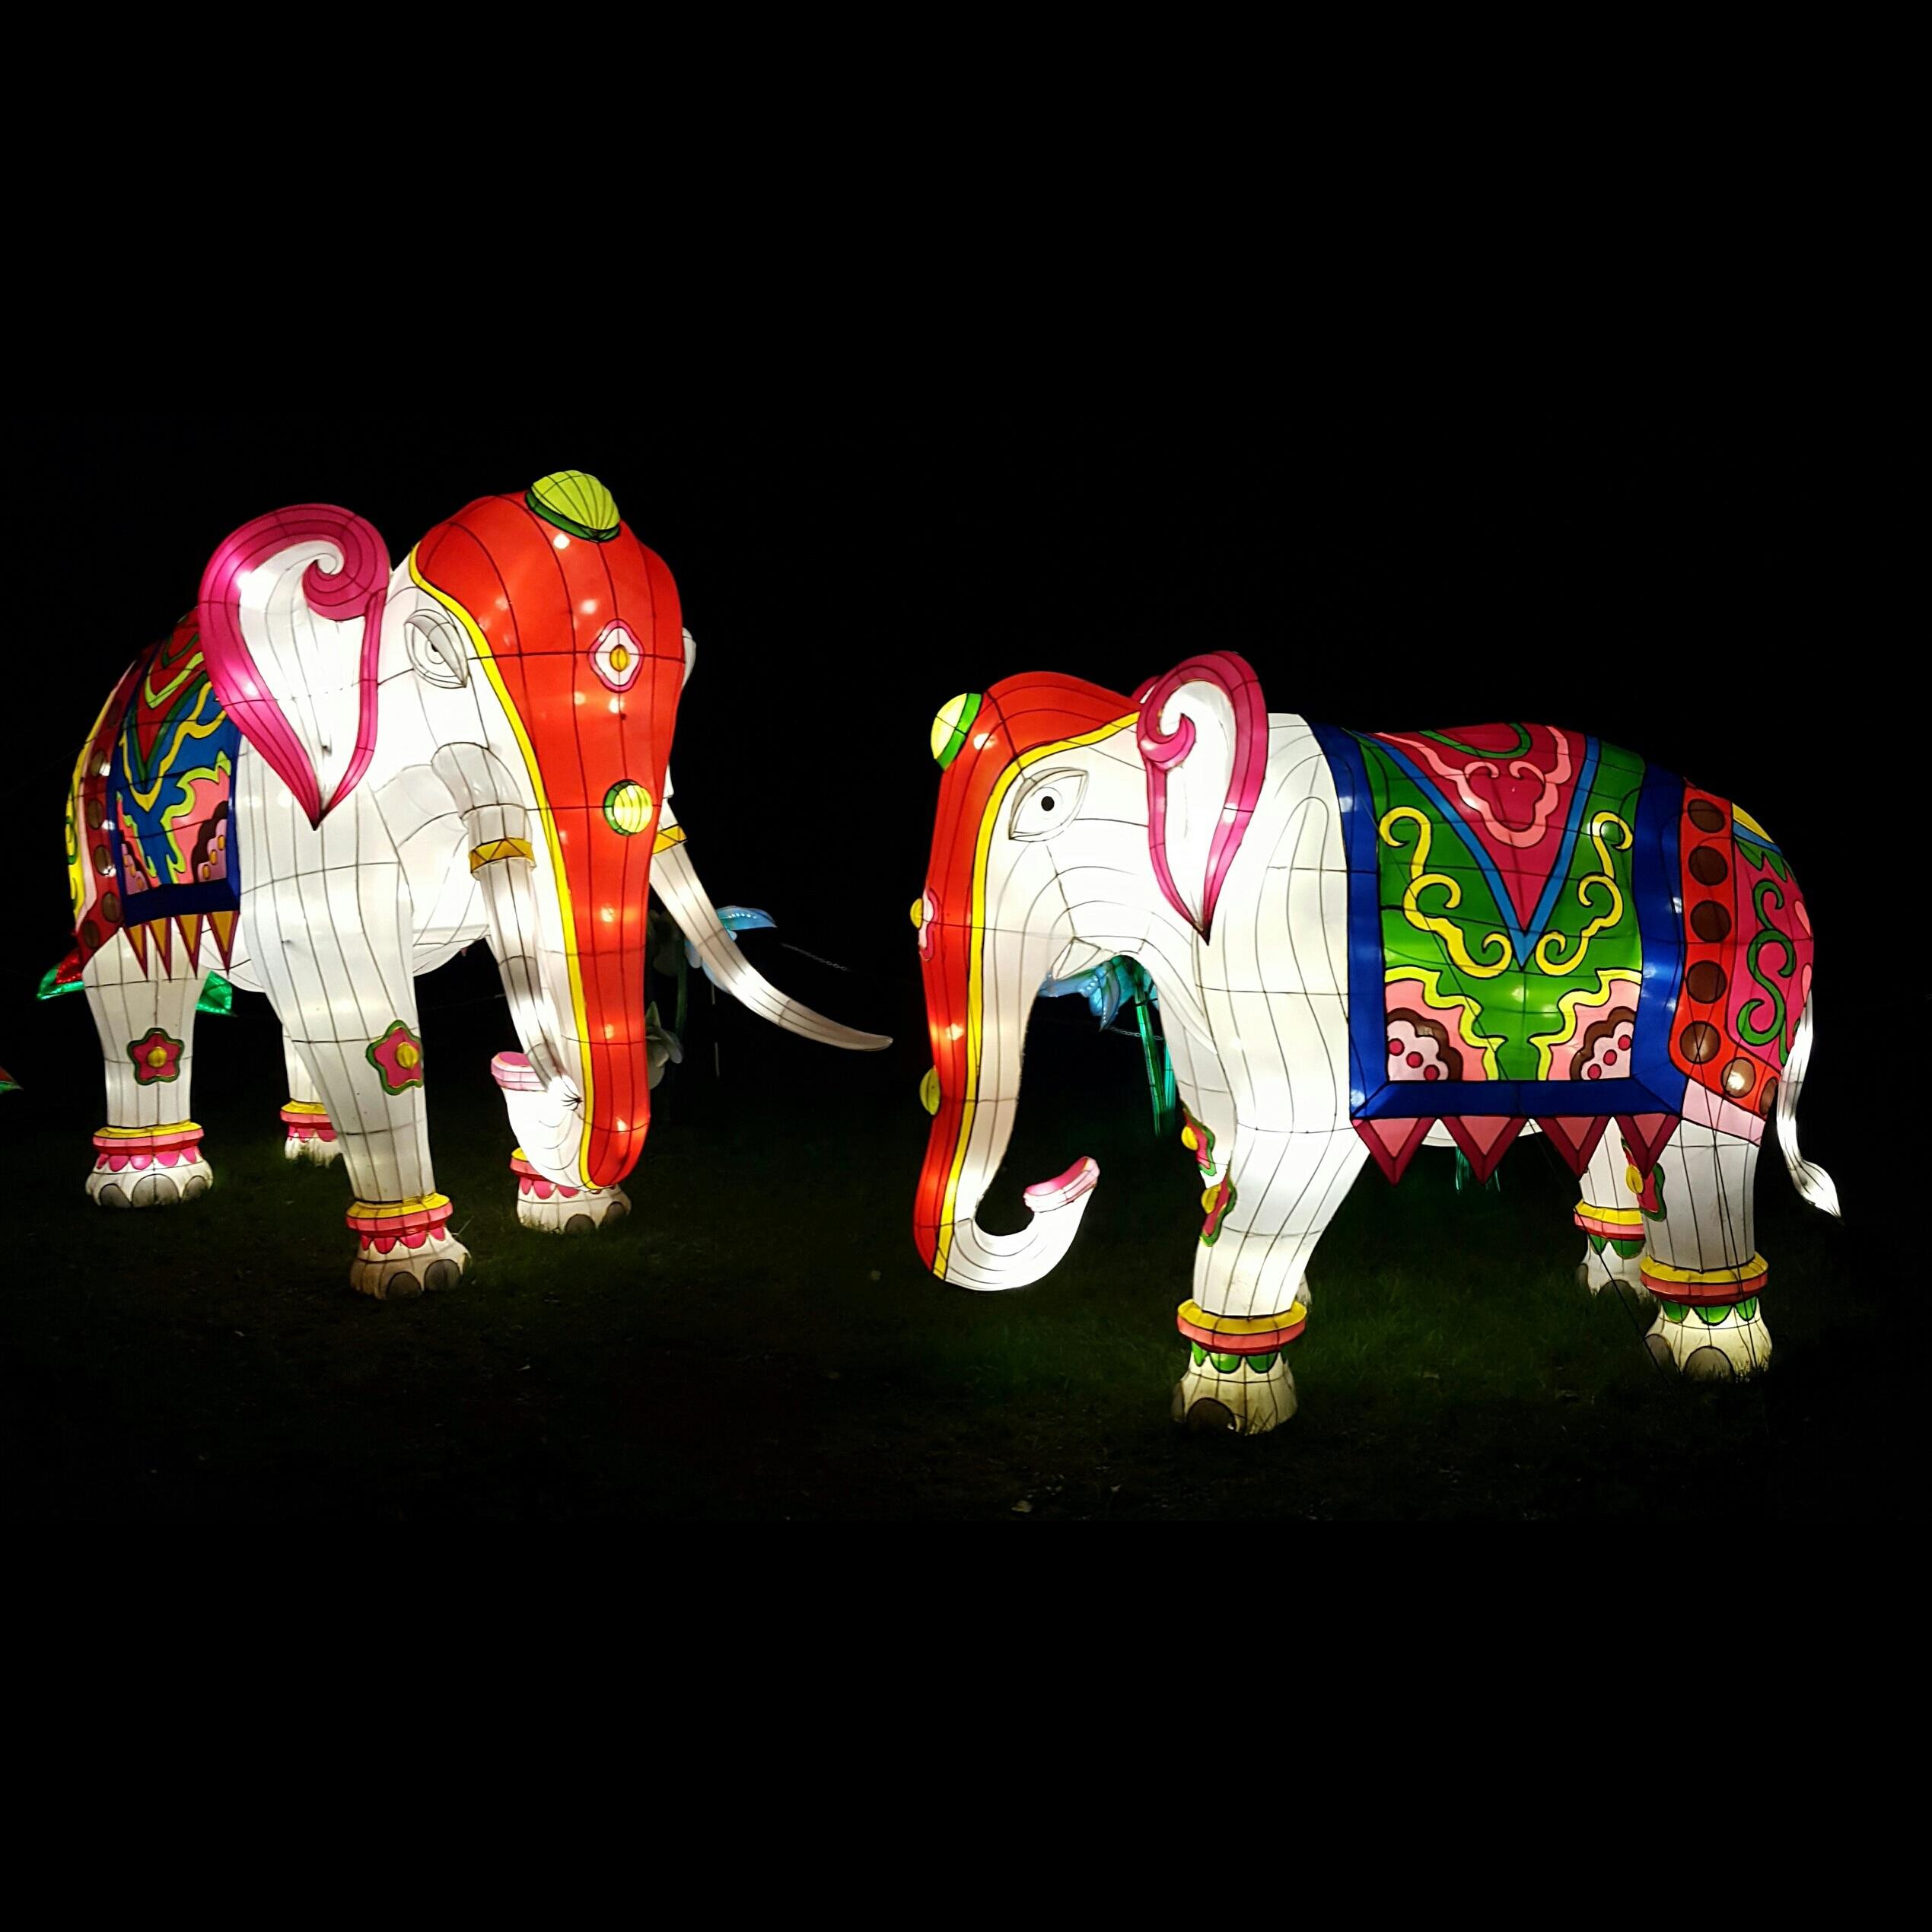 Gambar Outdoor Cahaya Dekorasi Artistik Mainan Seni